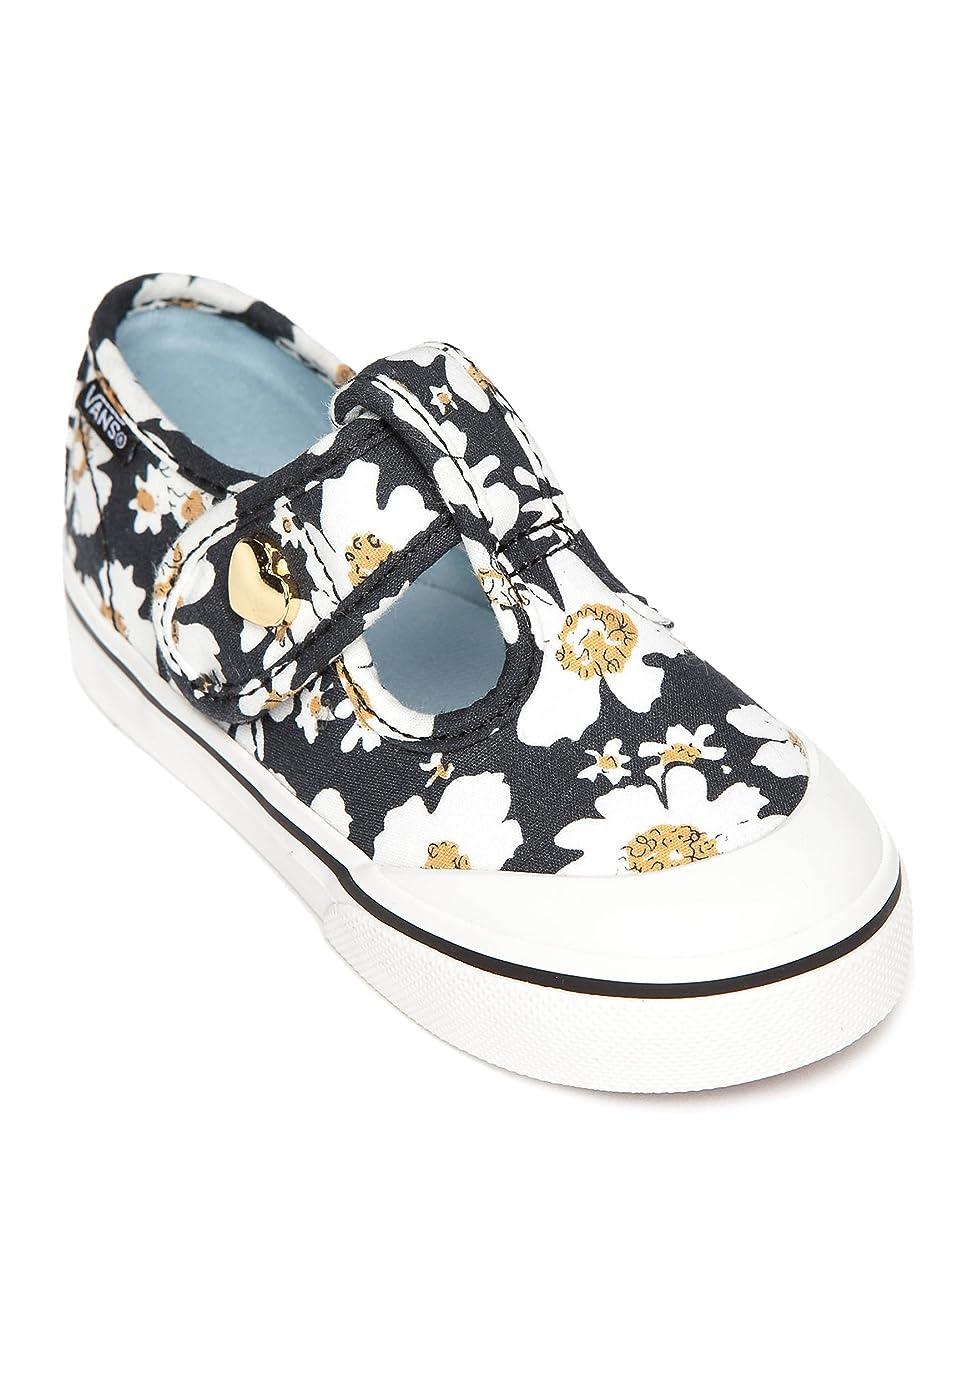 Vans Leena Daisy Black/Blue Toddler Girls Shoes